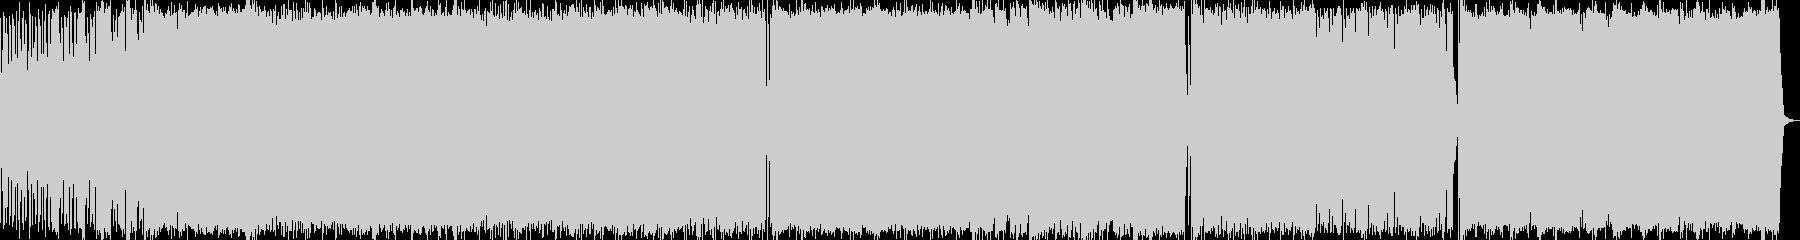 CiberイメージEDM-BGMの未再生の波形